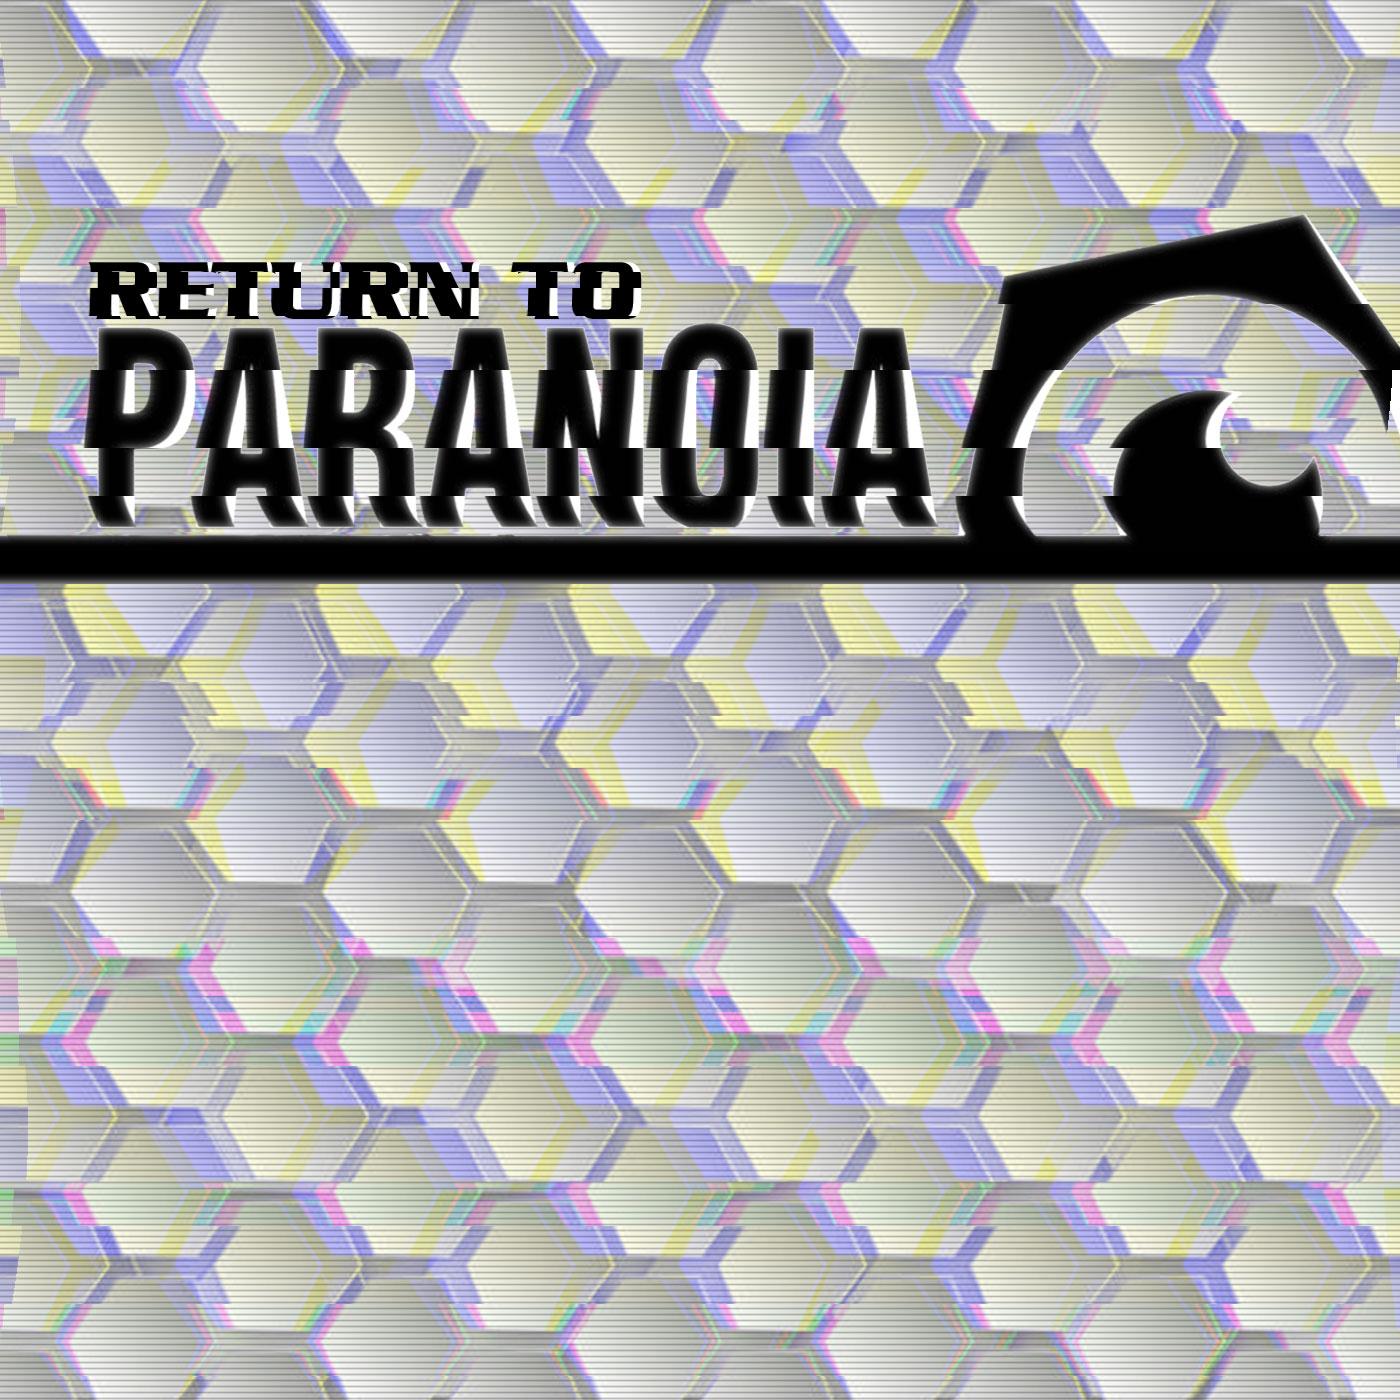 Paranoia-3-Titlecard-no-logo.jpg